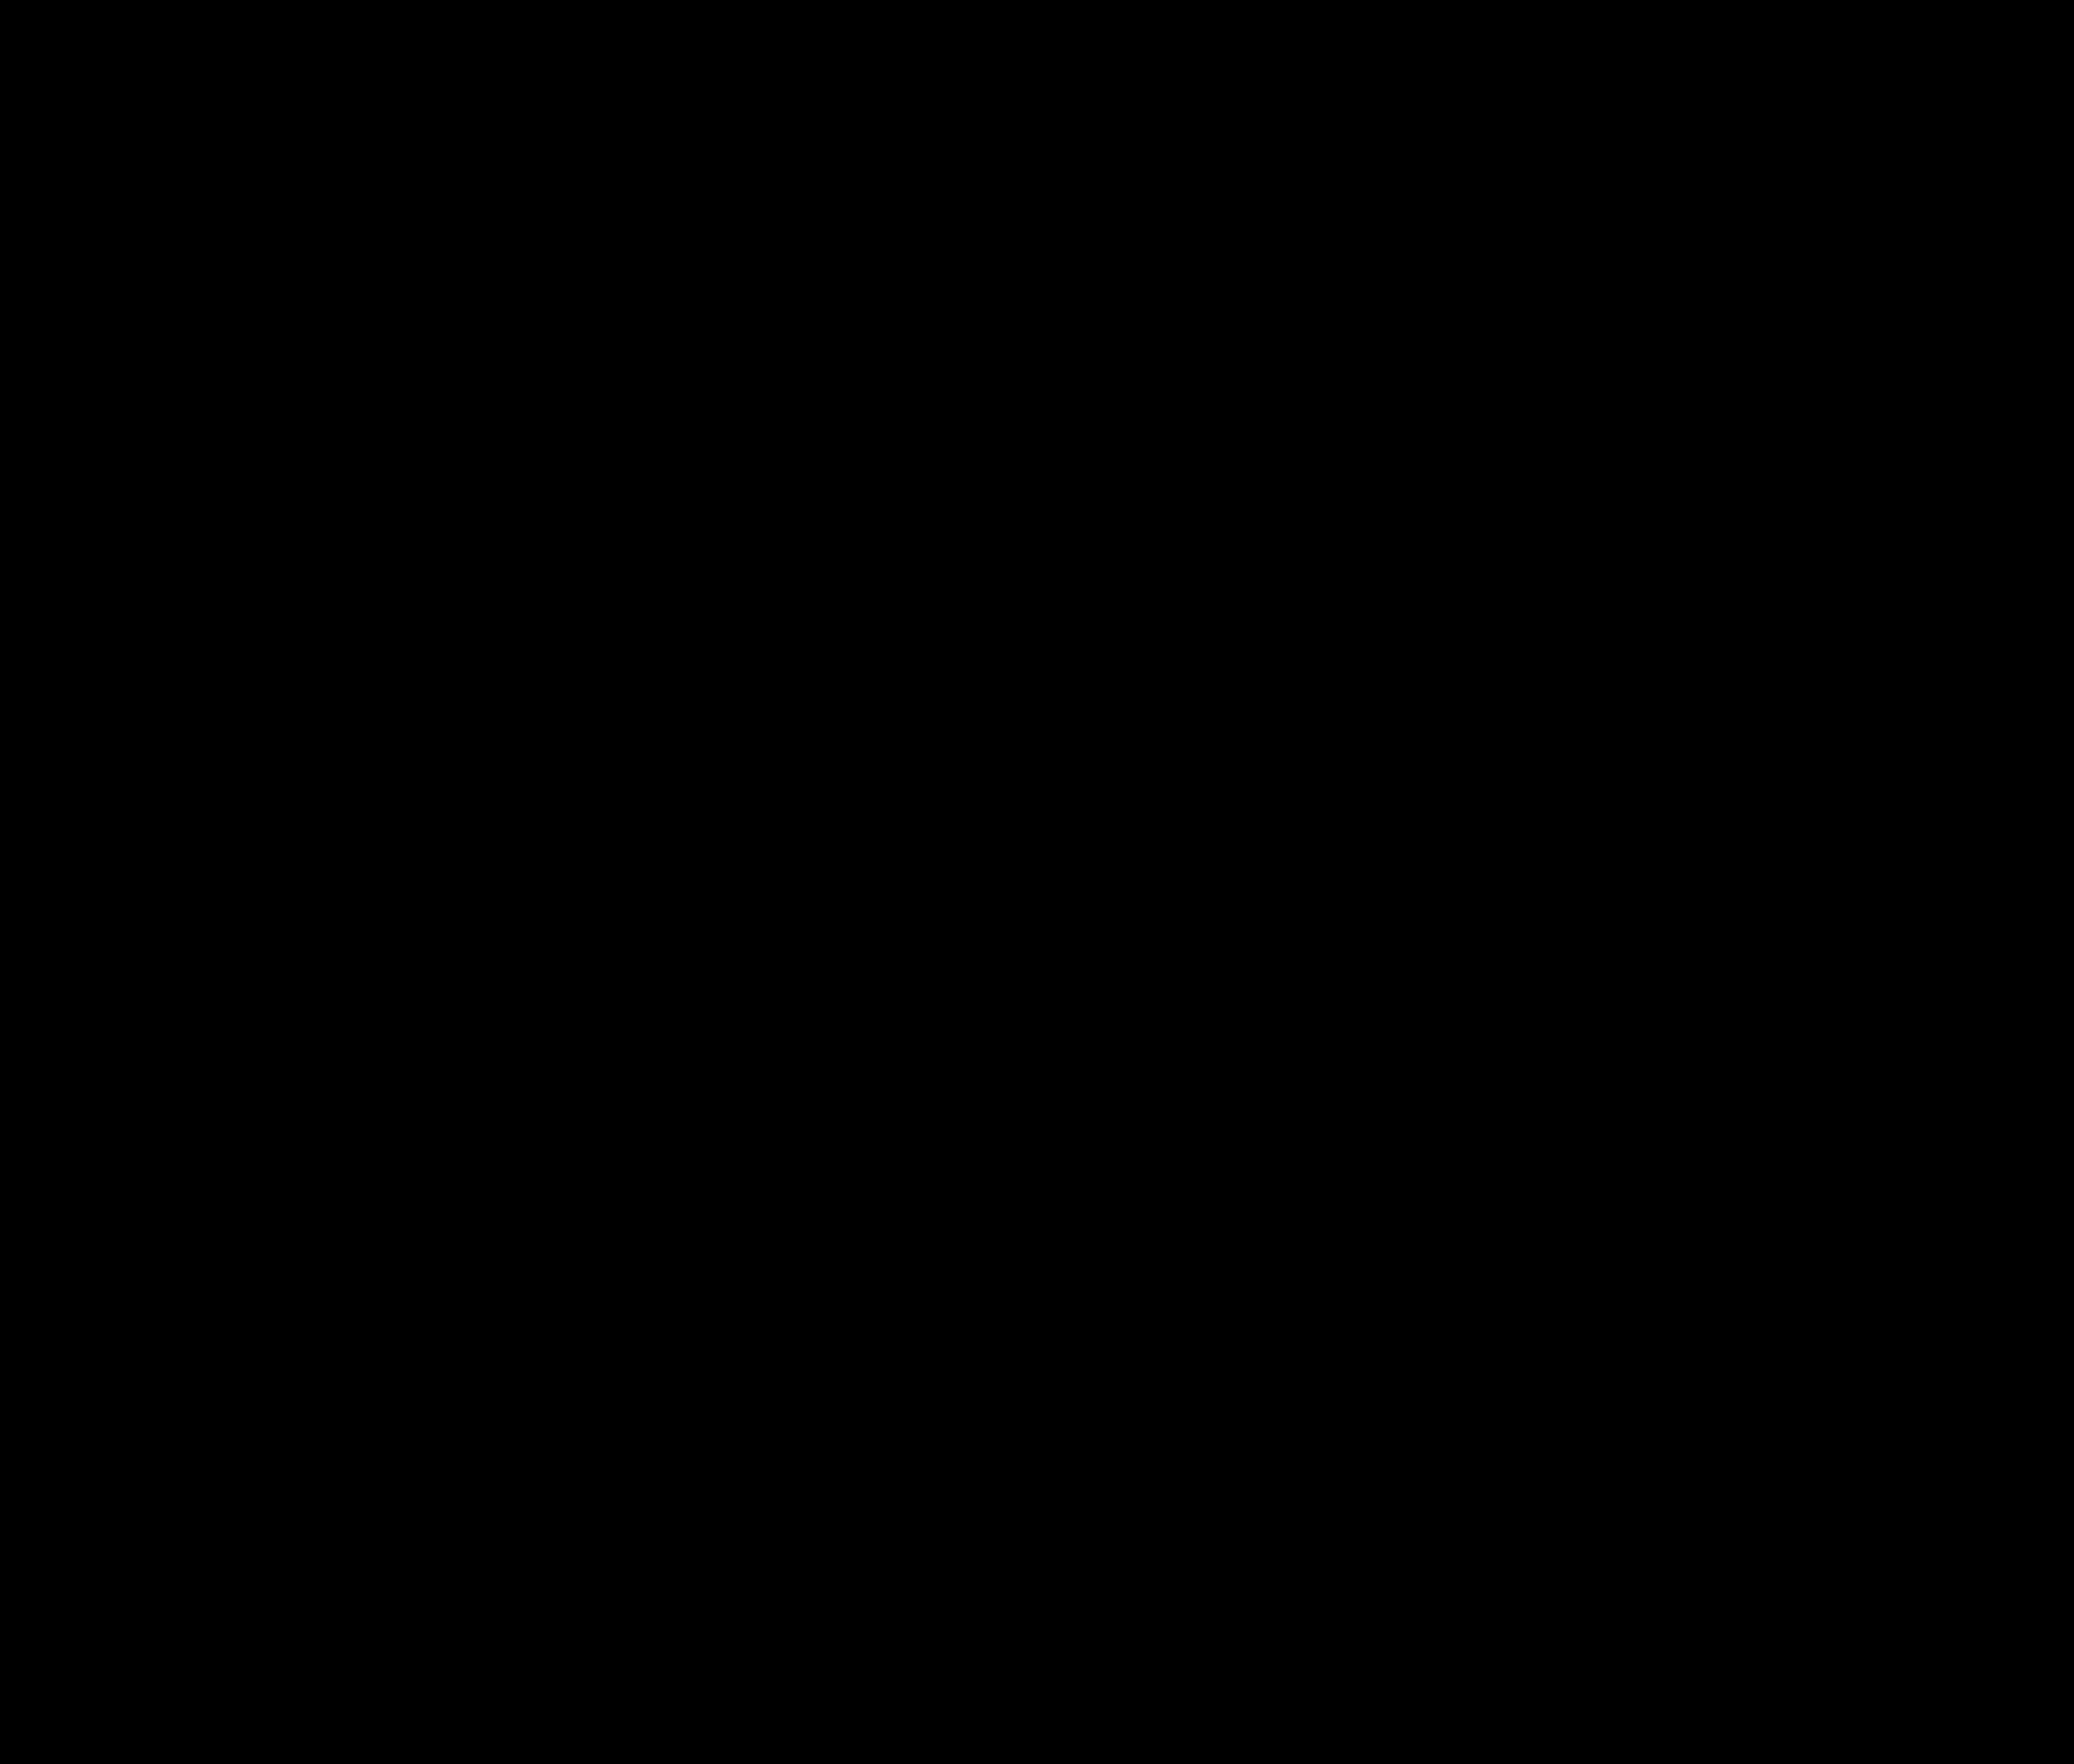 Naklejka na ścianę sokół ptak 4